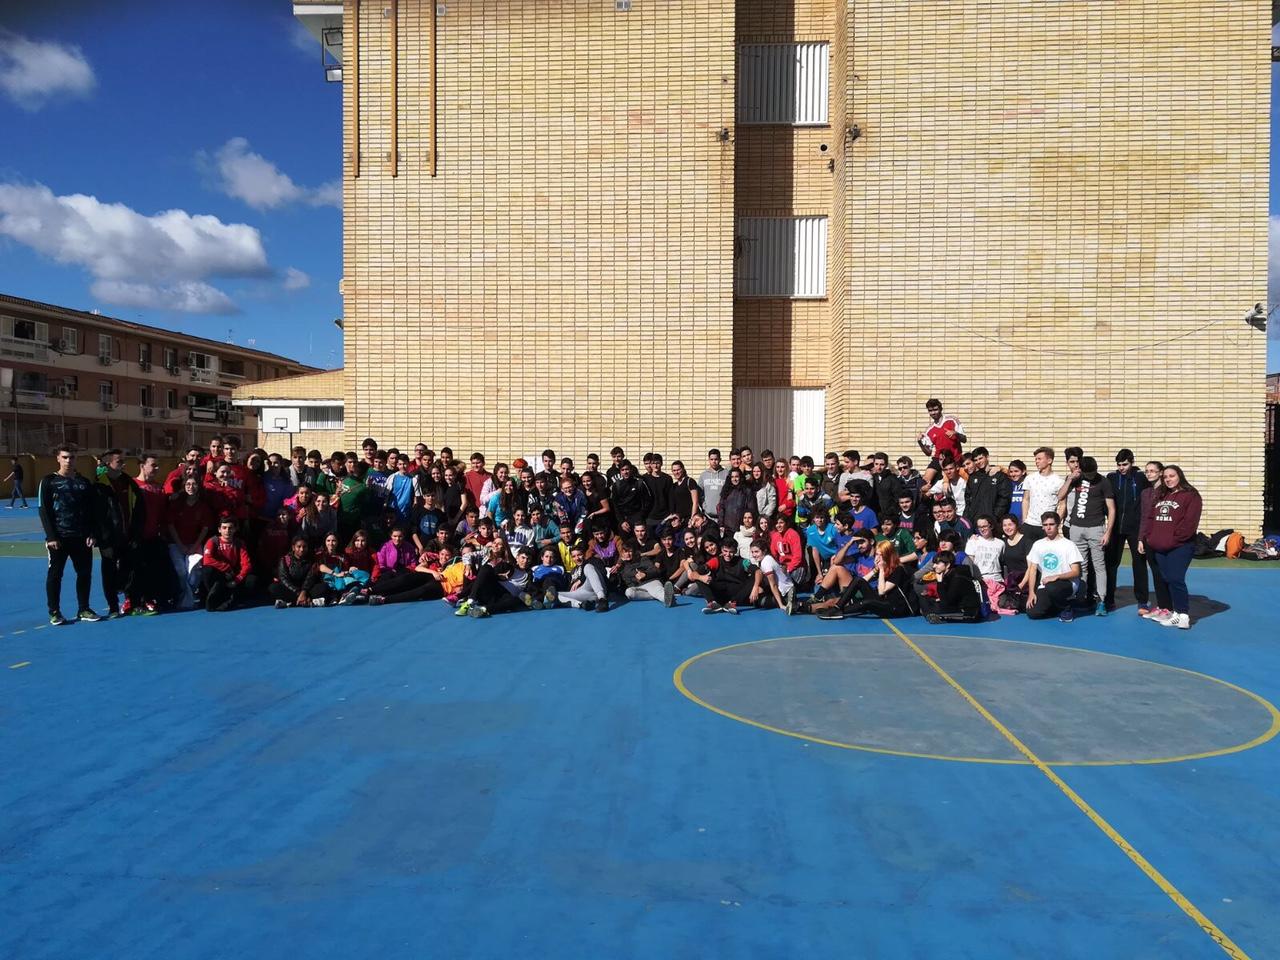 Liga intercentros en ies la fuensanta for Oficina virtual junta de andalucia educacion